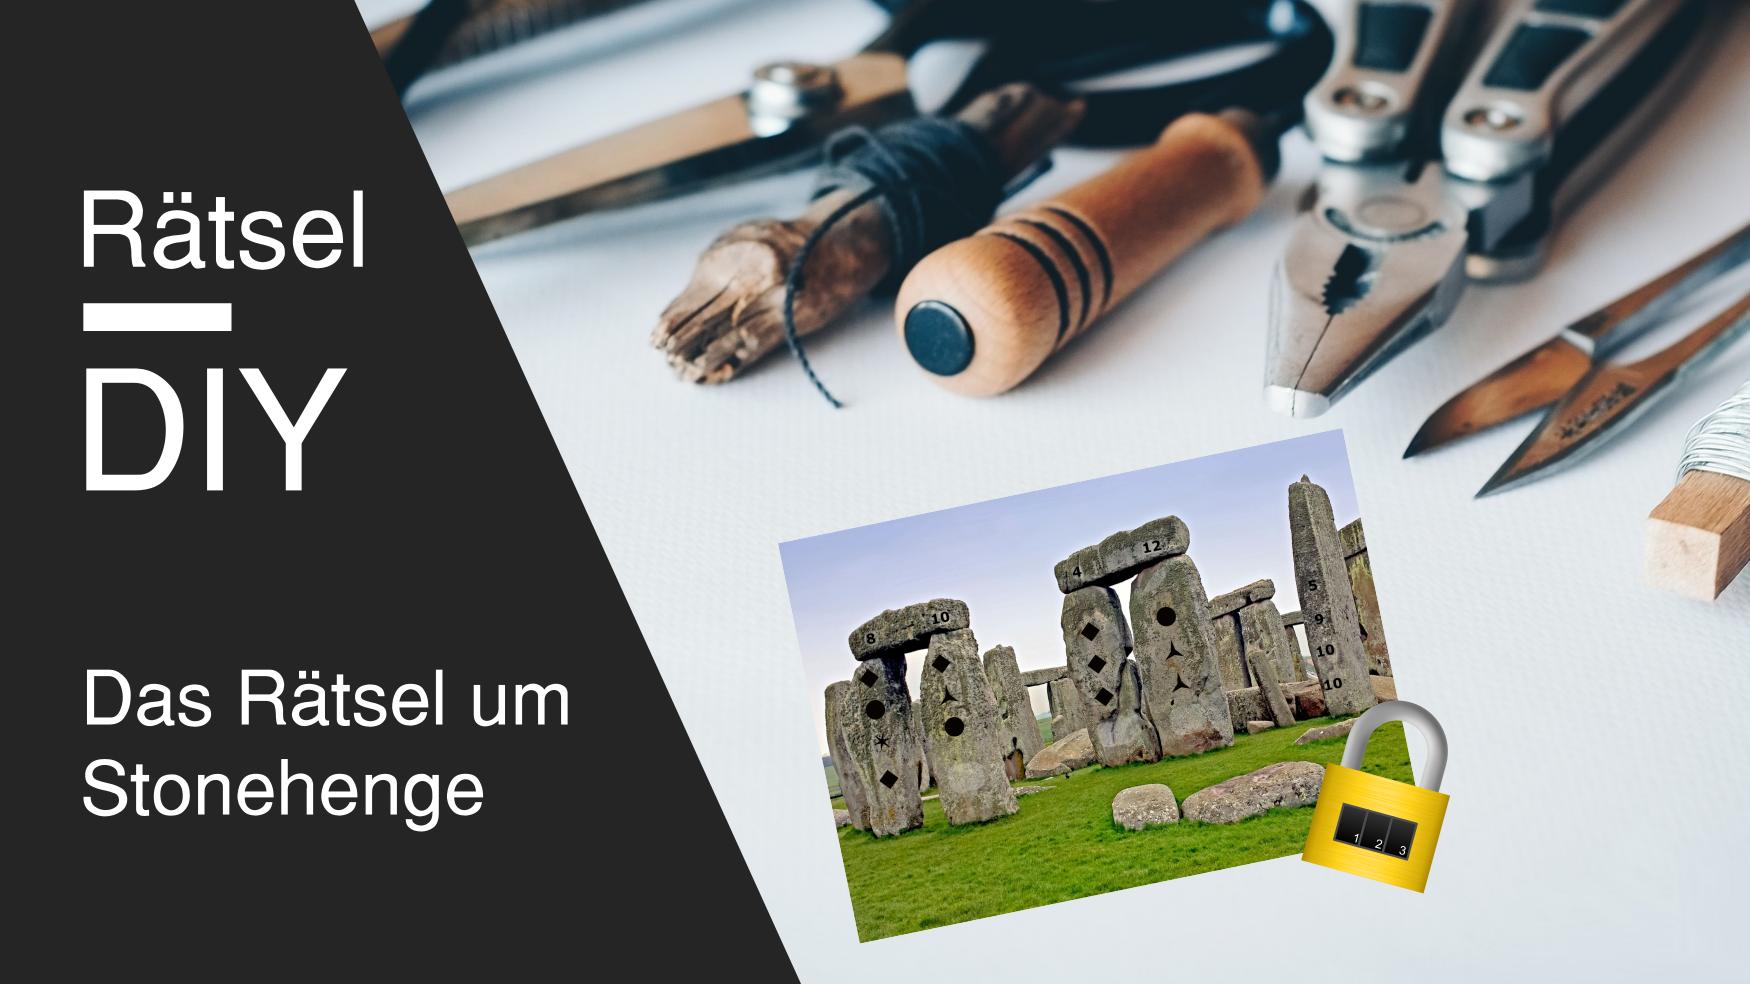 DIY Escape Room Rätsel Idee Stonehenge für Erwachsene